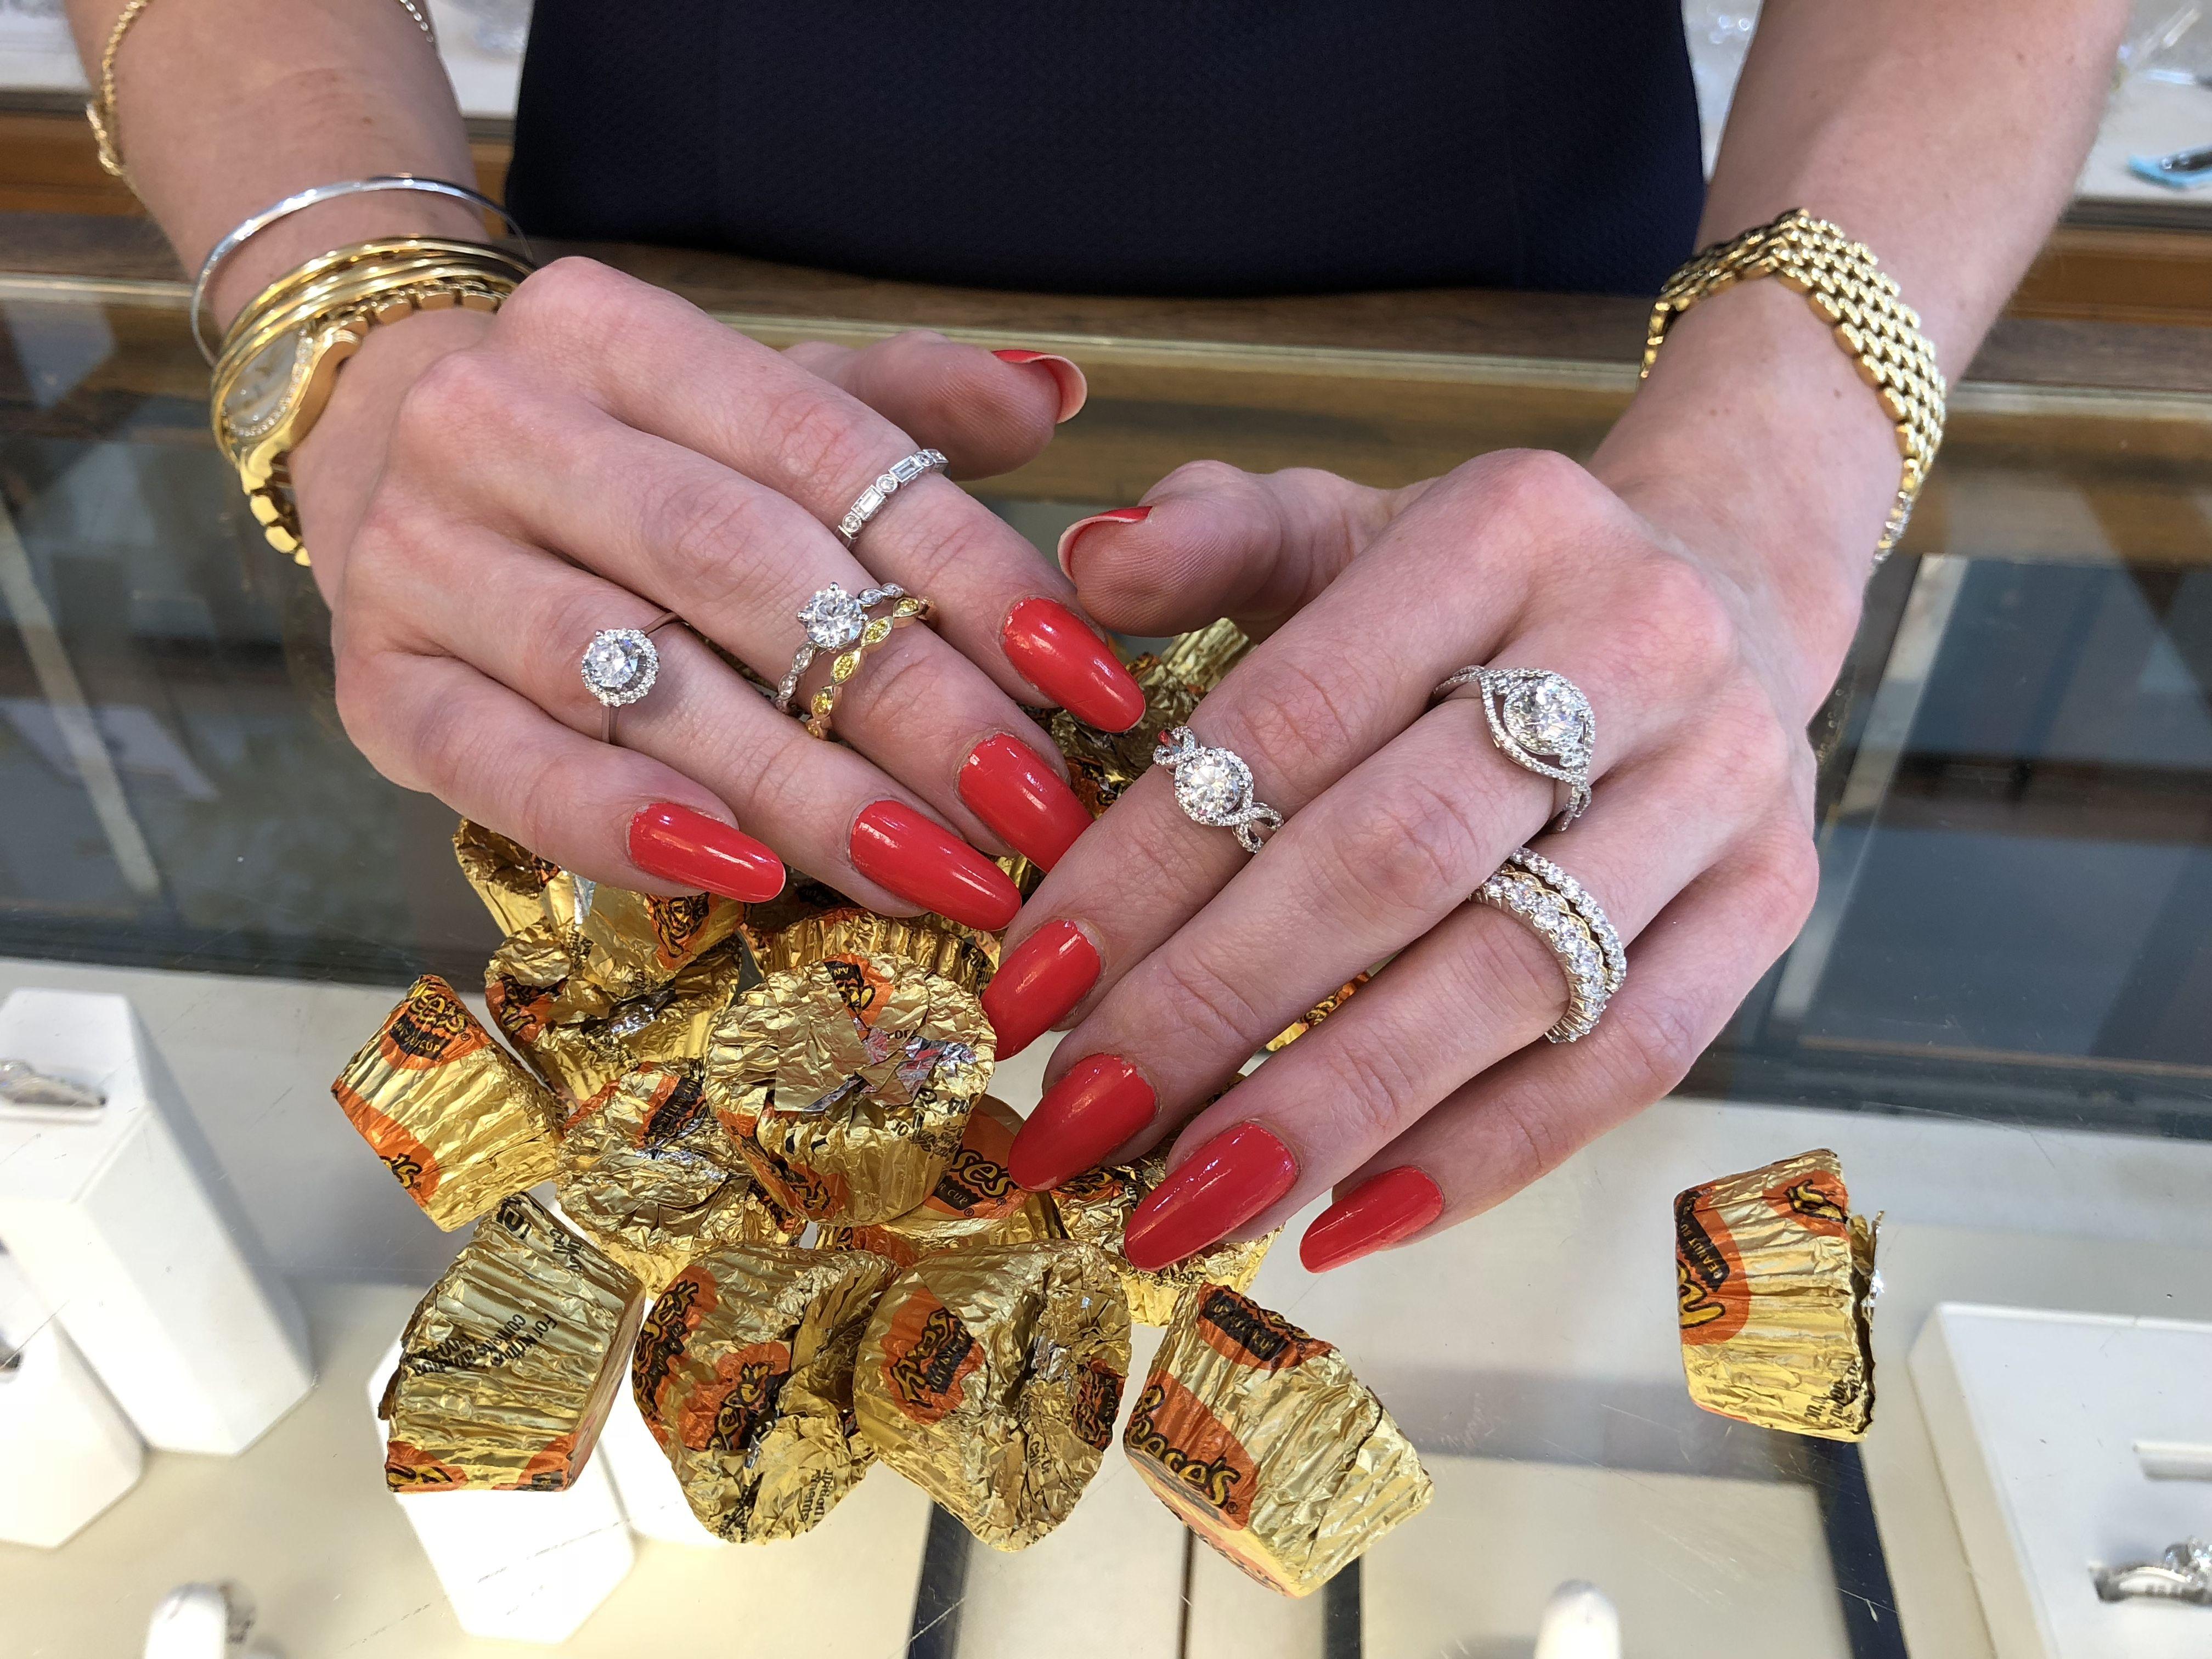 34+ Jewelry stores in perrysburg ohio ideas in 2021